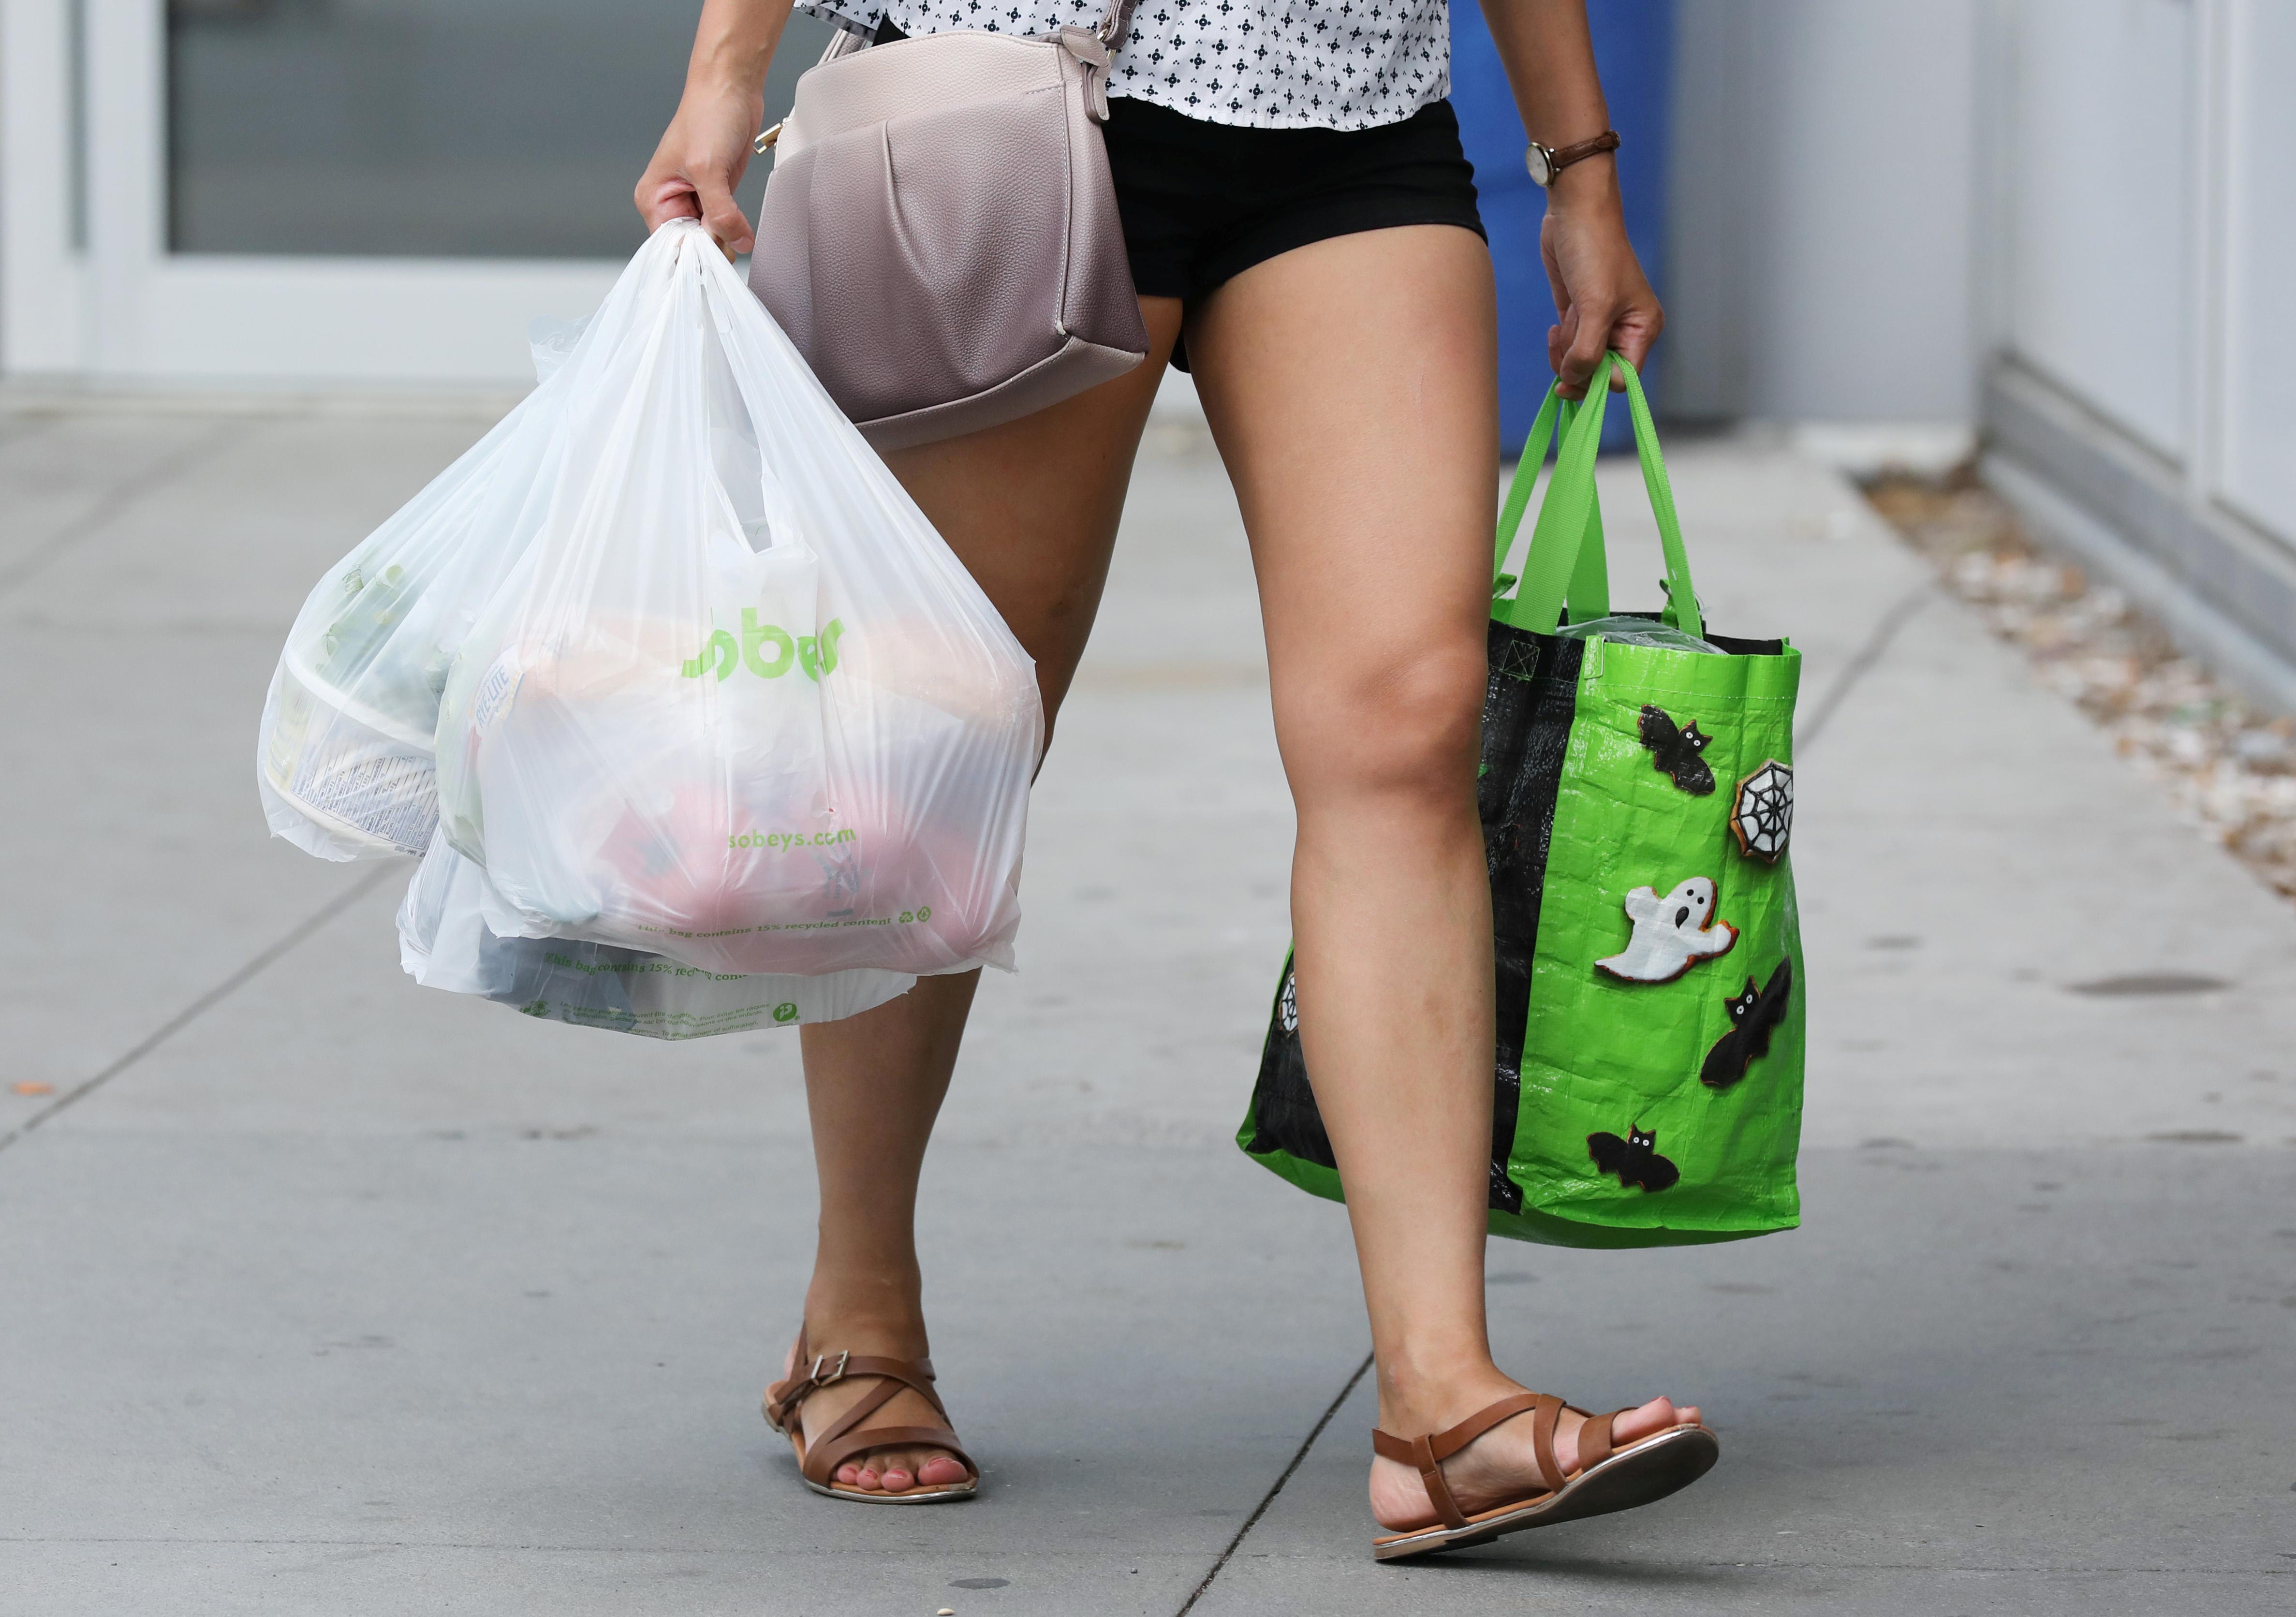 Plastic-bag overload.